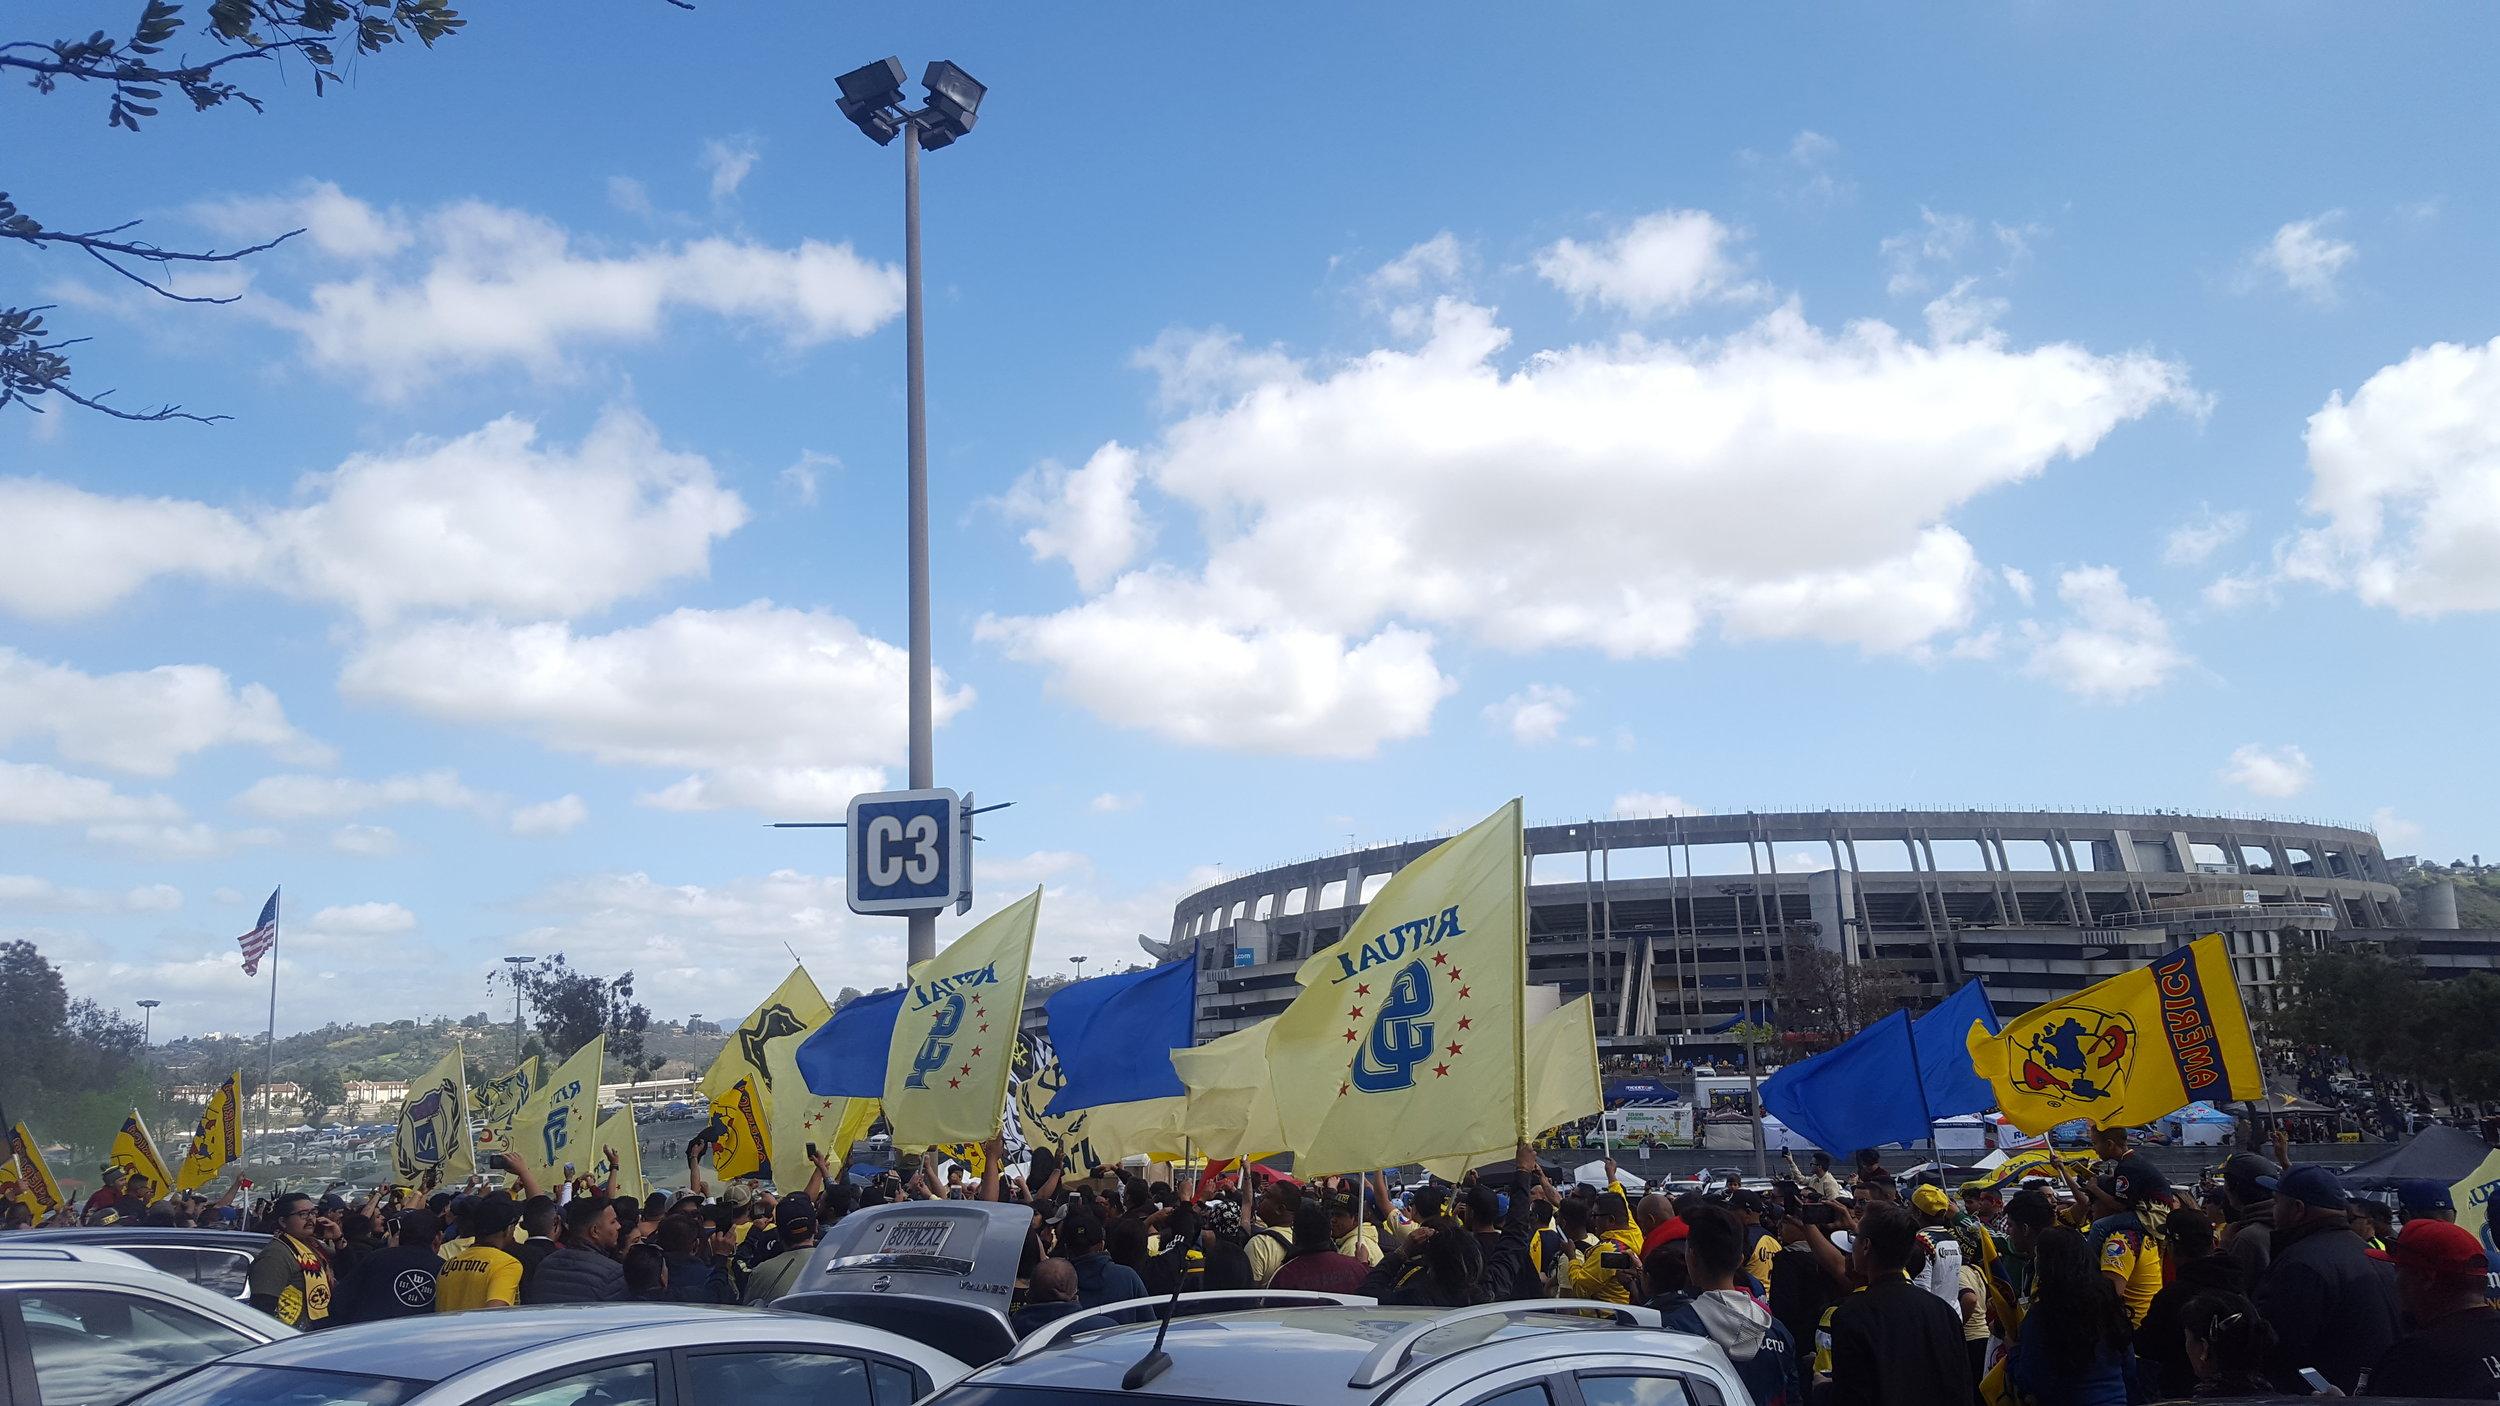 Club America fans outside of SDCCU Stadium